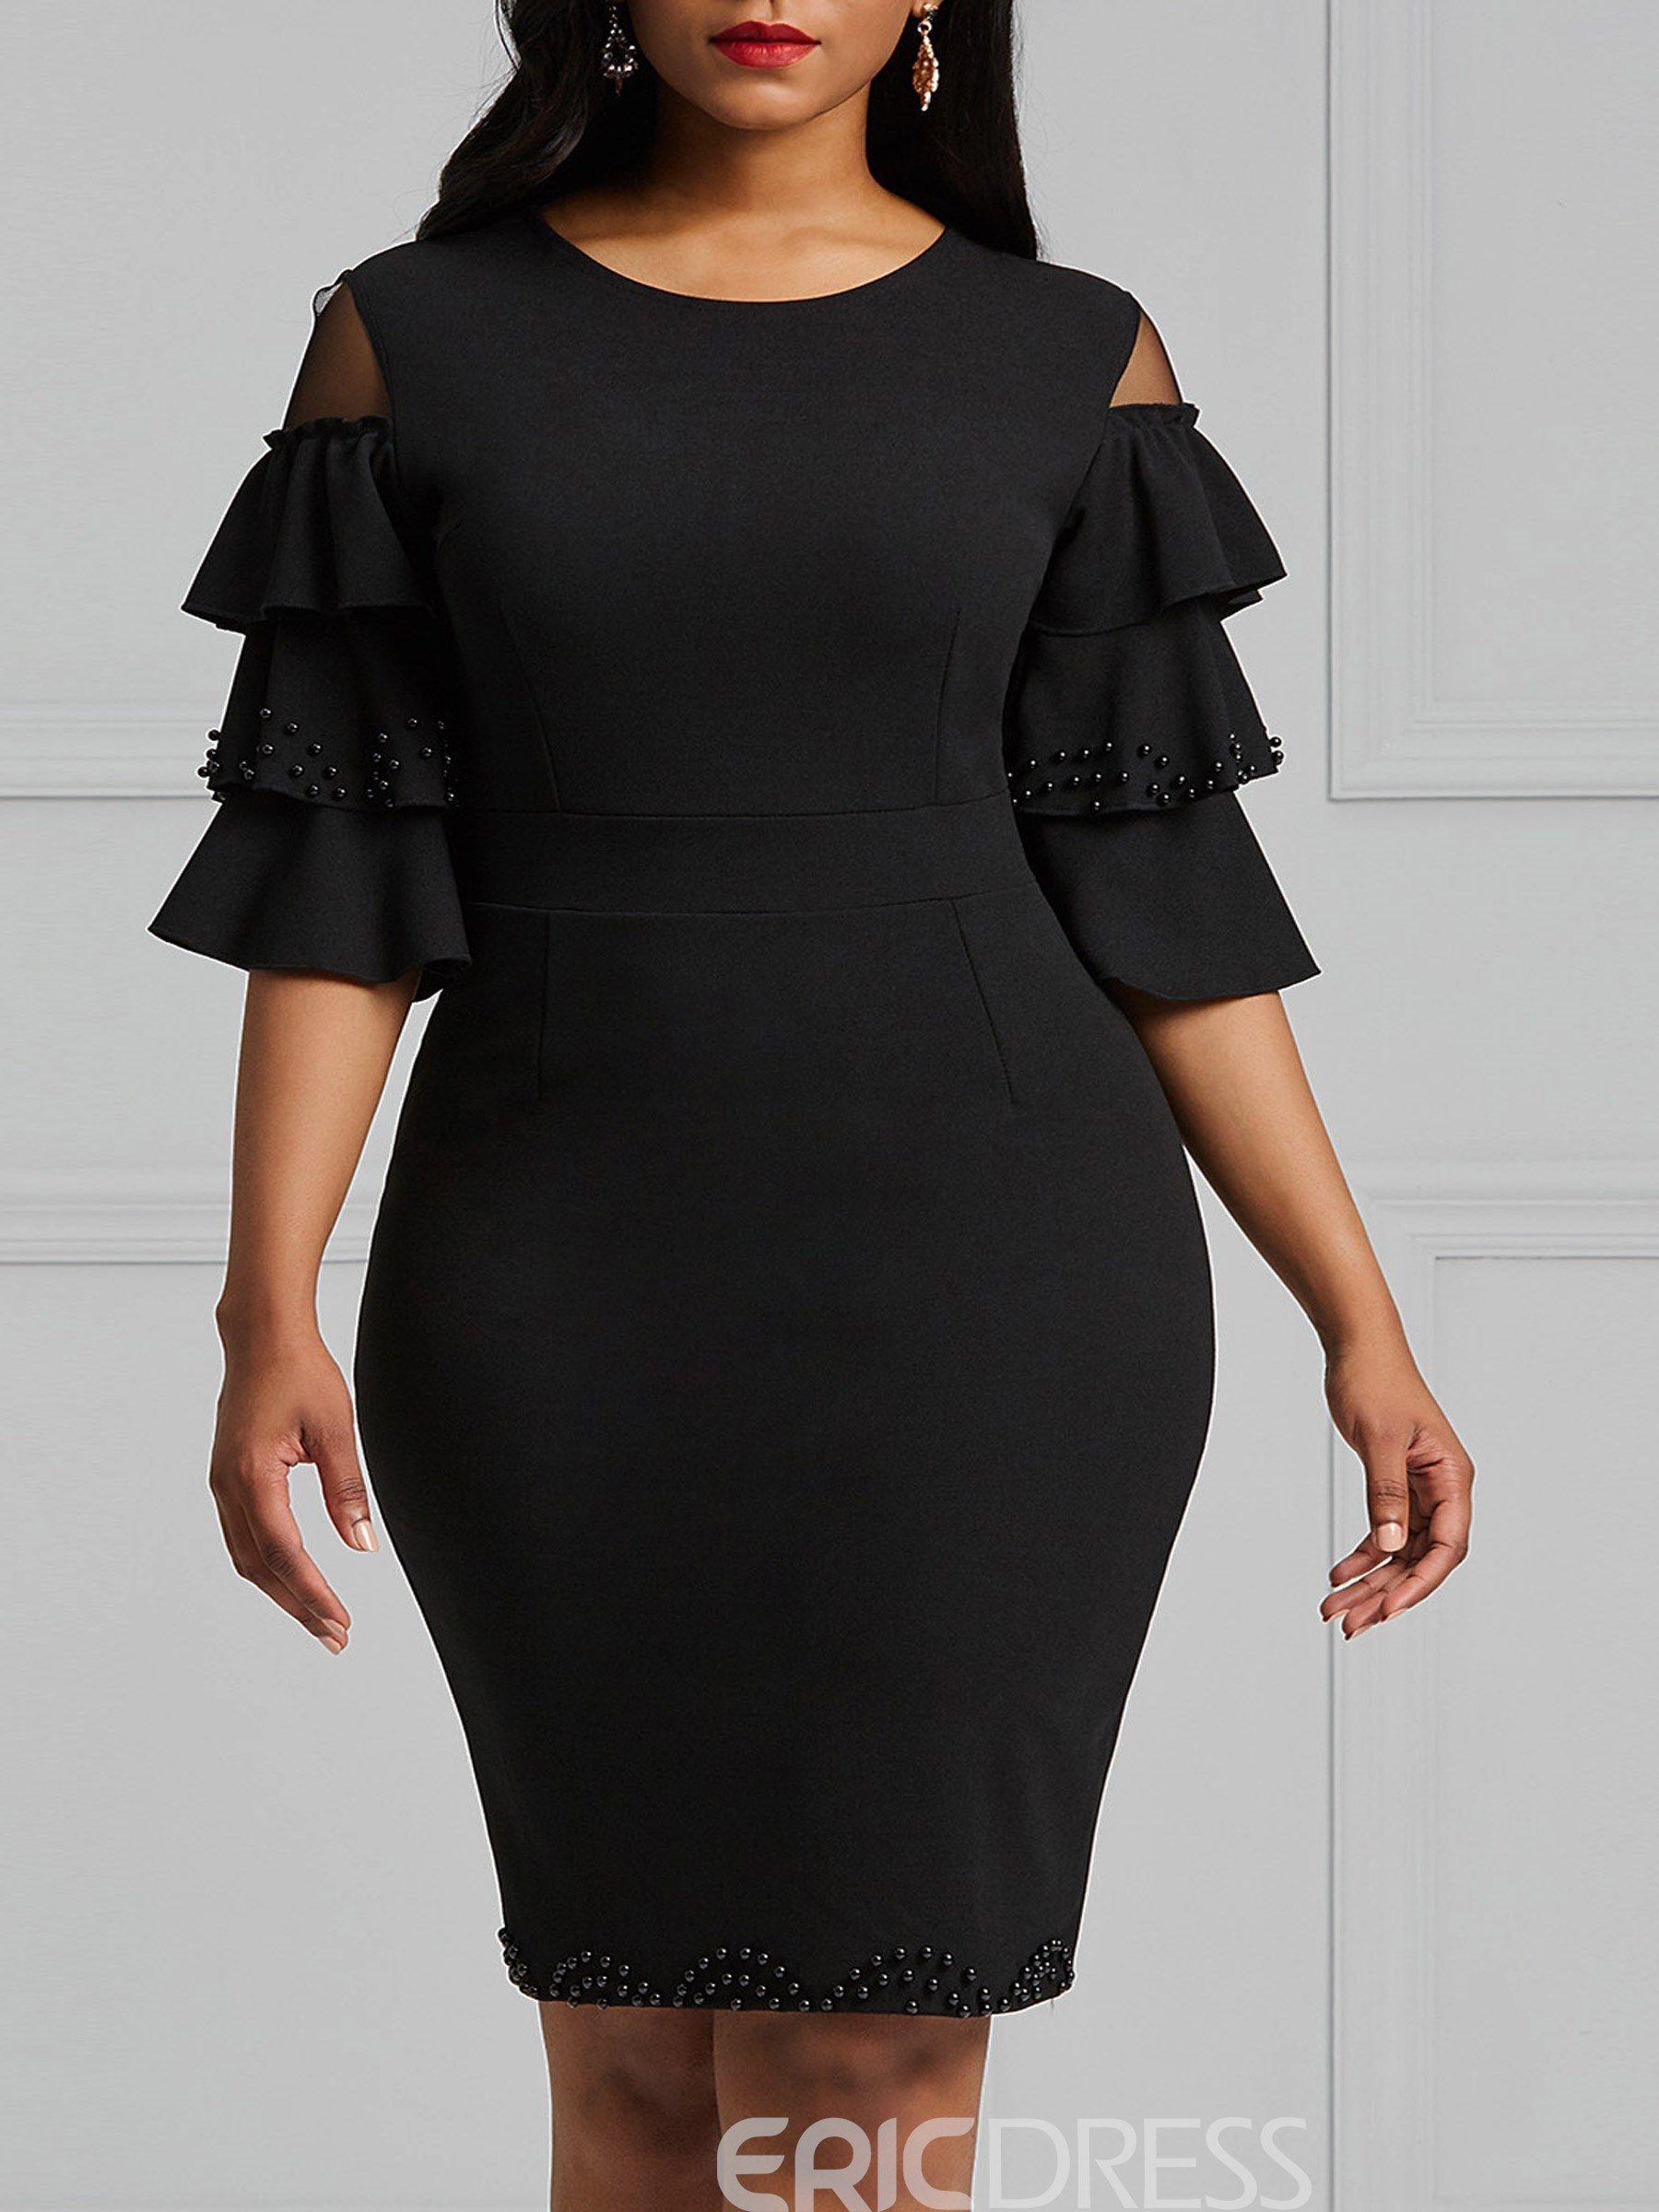 Ericdress Flare Bead Sleeve Bodycon Women S Dress Women Lace Dress African Print Fashion Dresses African Fashion Women Clothing [ 2400 x 1800 Pixel ]